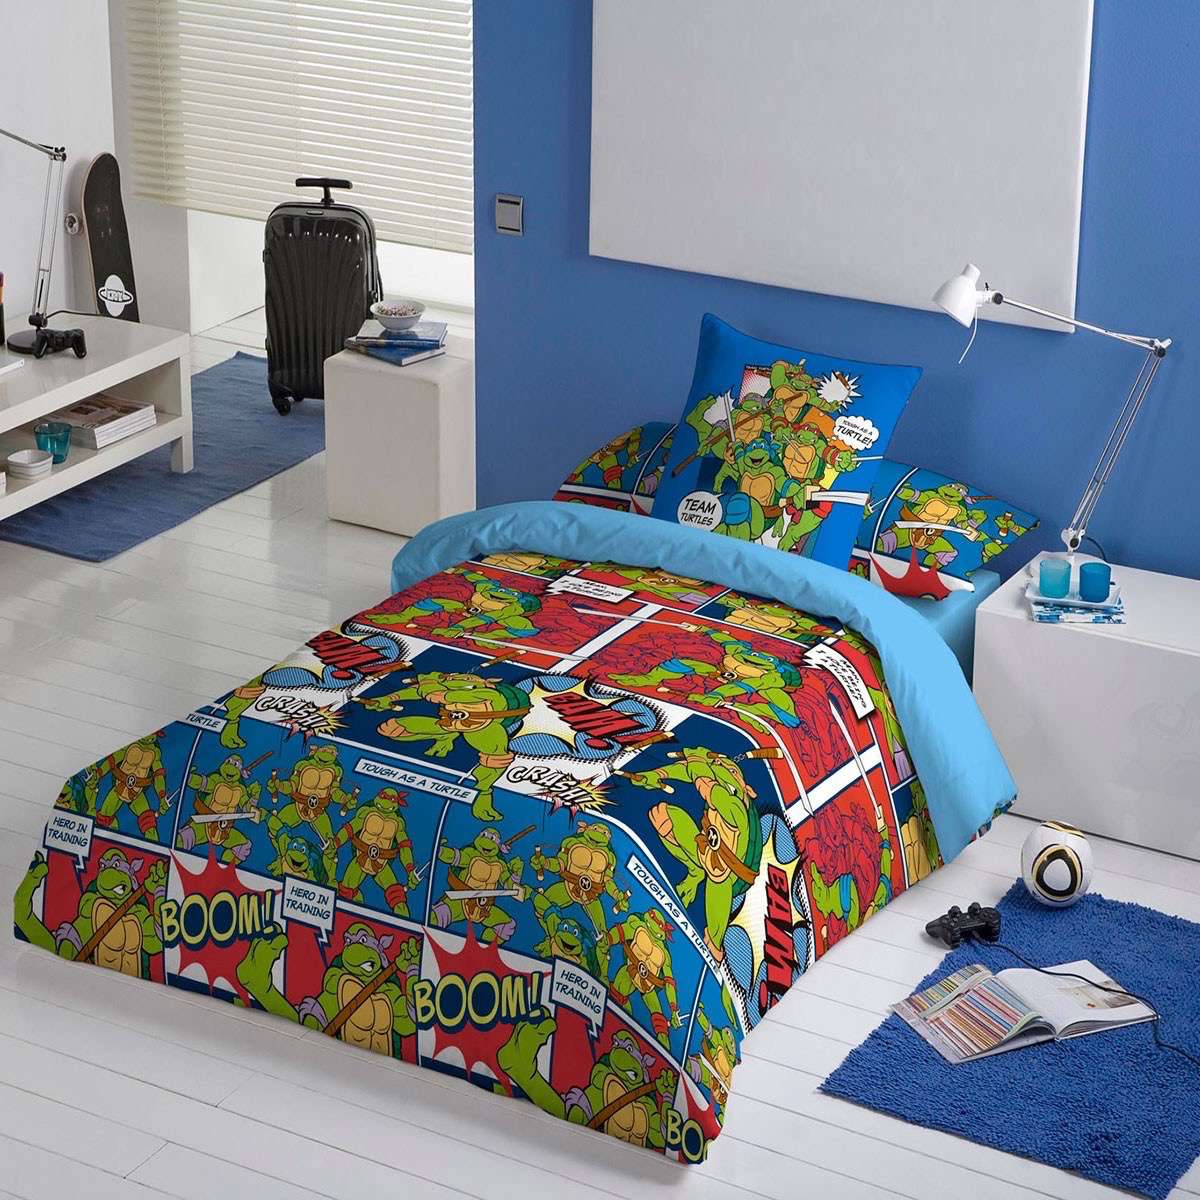 funda-nordica-tortugas-ninja-cowabunga-color-azul-56f